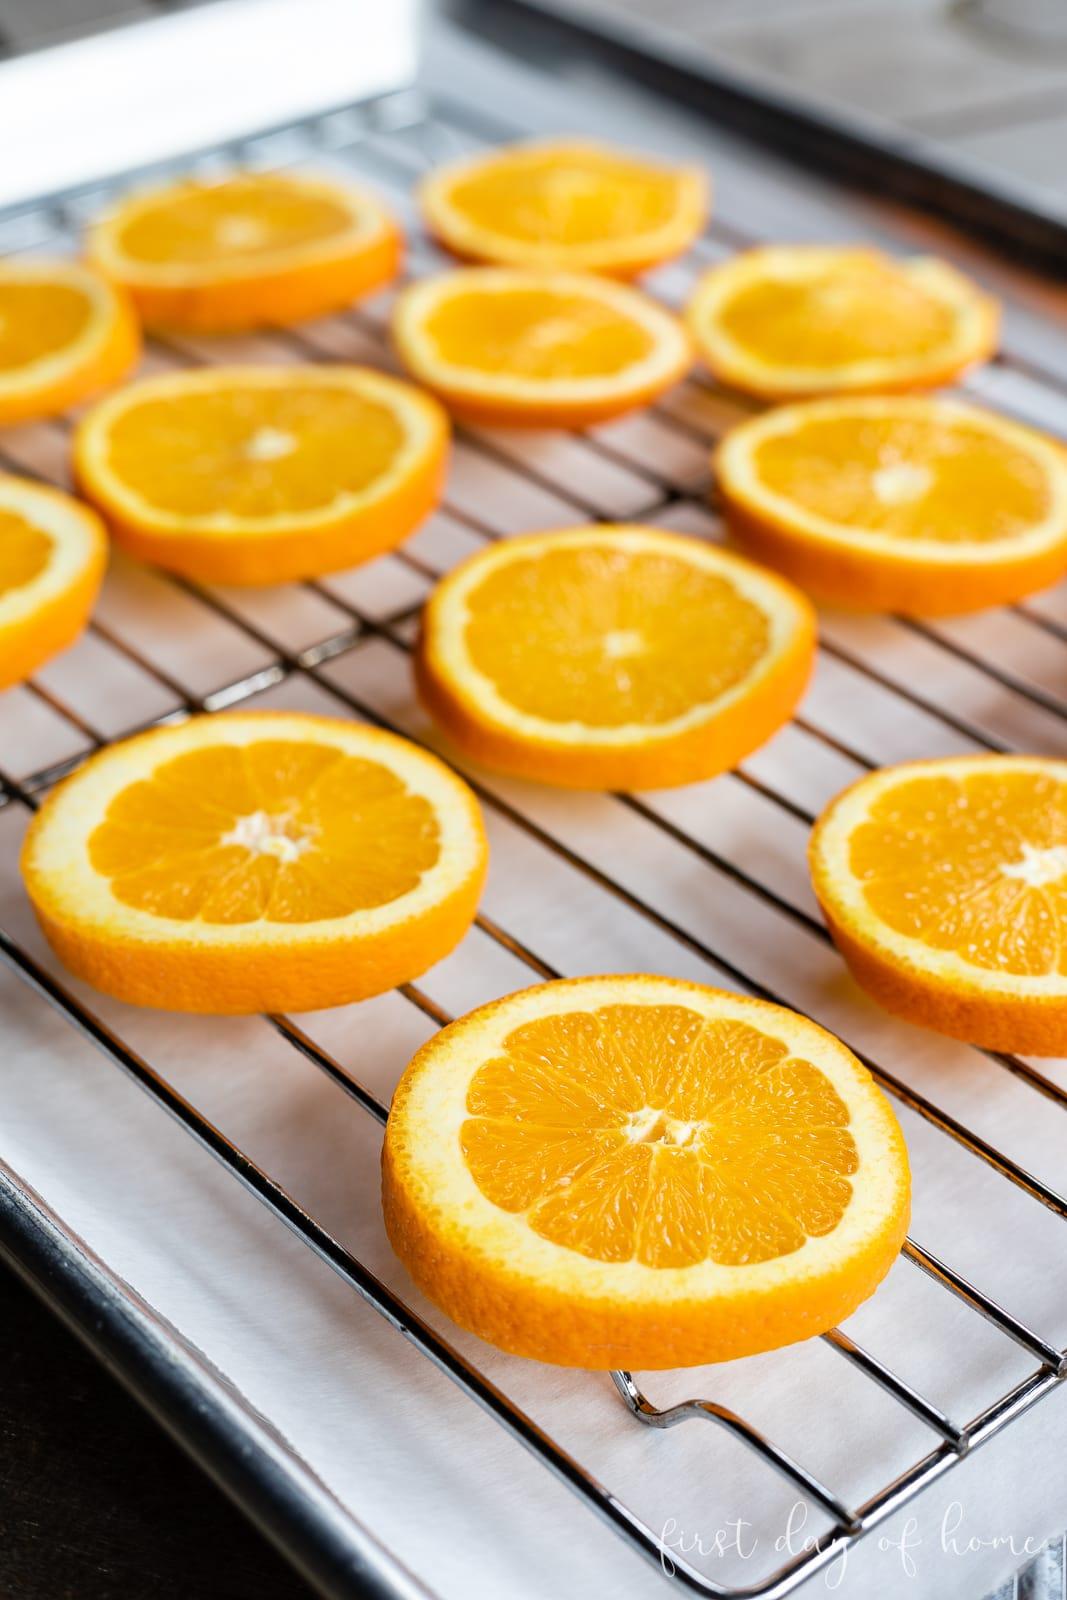 Raw orange slices on baking rack